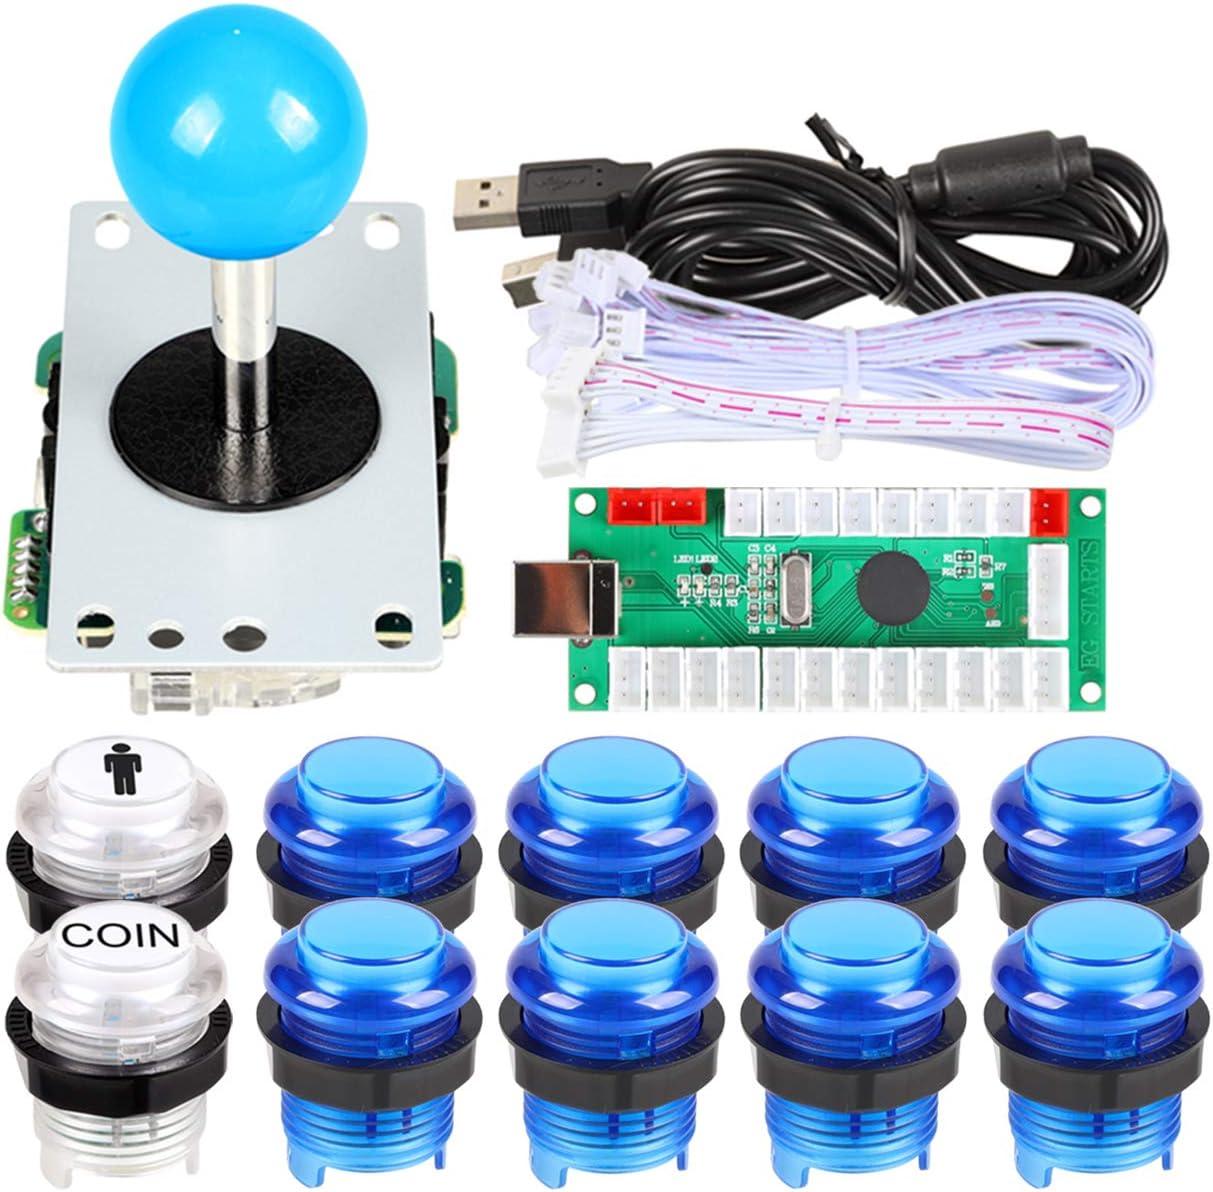 EG STARTS 1 jugador USB LED Encoder para PC Juegos Blue Stickers Controllers + 10x LED Botones iluminados para Arcade Joystick DIY Kits Partes Mame Raspberry Pi 1 2 3 3B